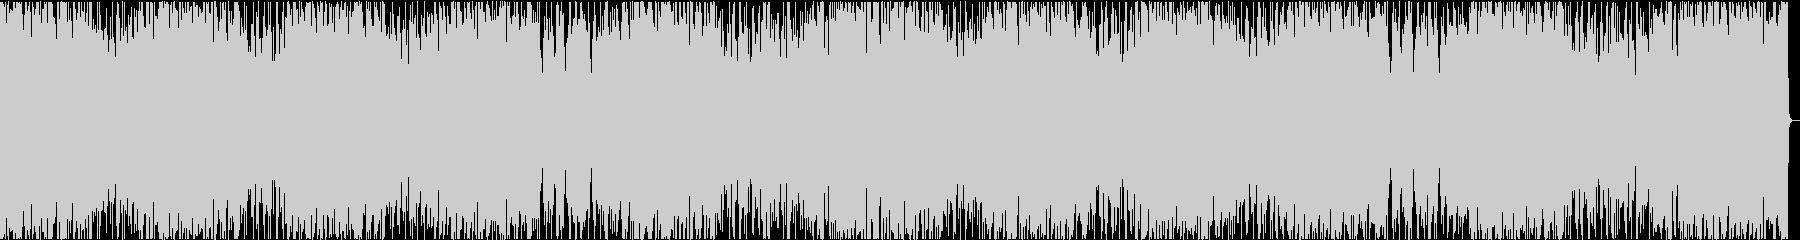 Ikeike / fast jazz / quiet's unreproduced waveform